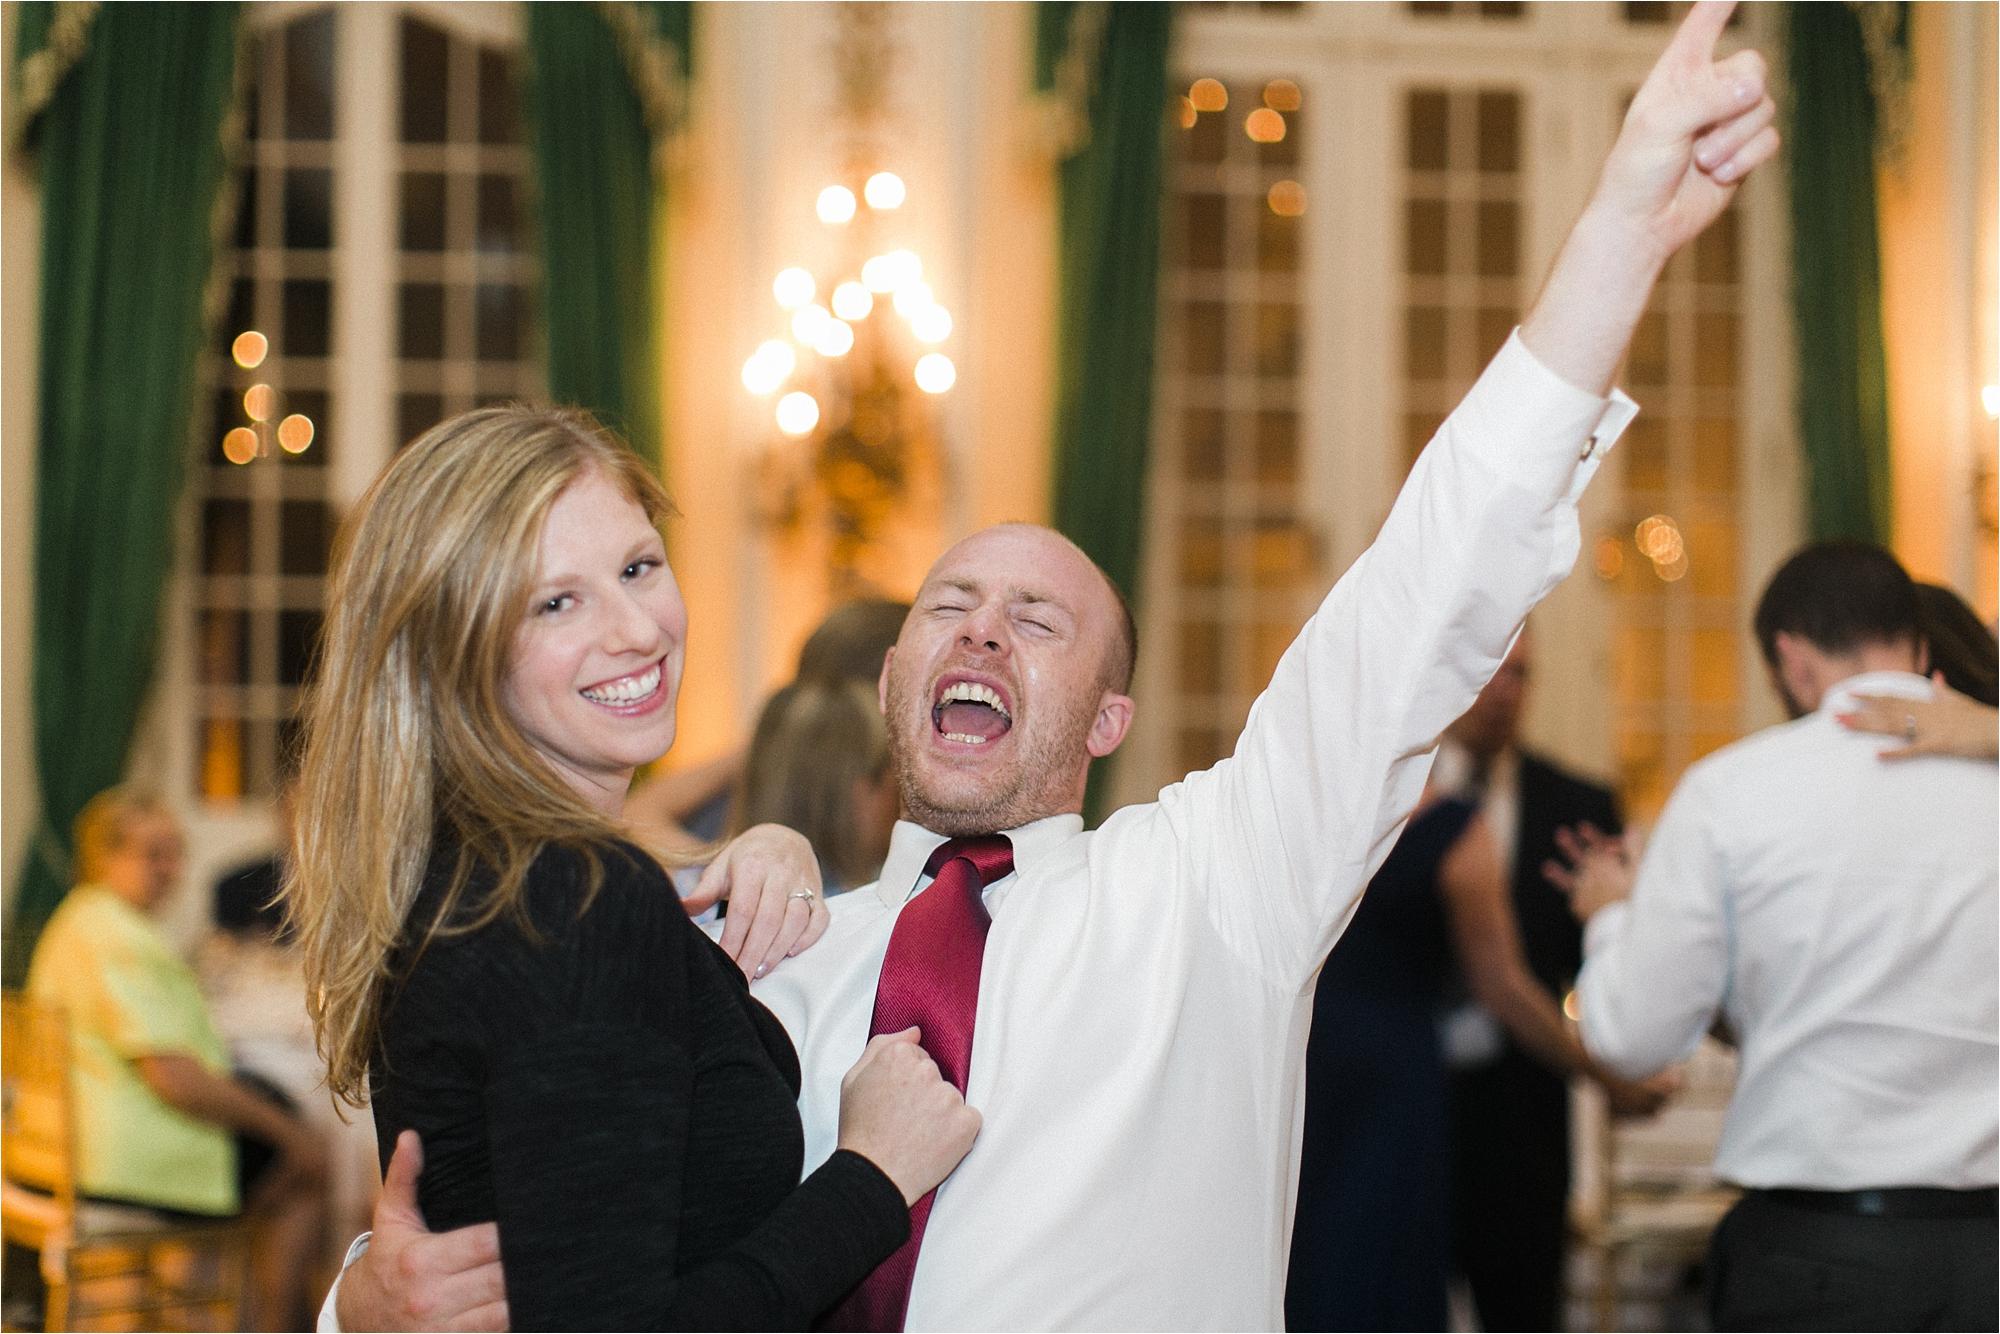 stephanie-yonce-photography-elegant-private-club-washington-dc-wedding-photos_0055.jpg